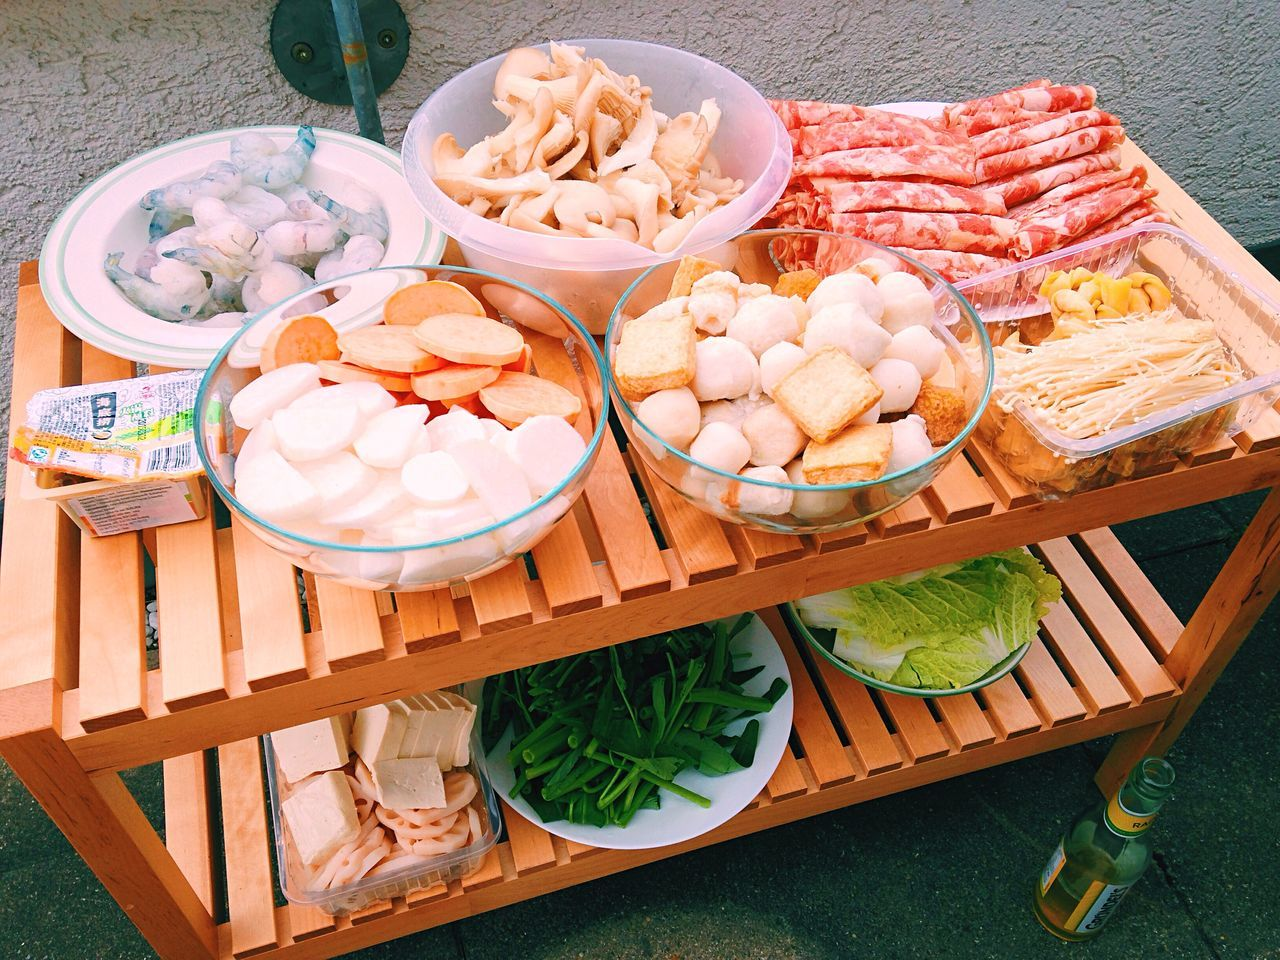 High Angle View Of Raw Food On Table